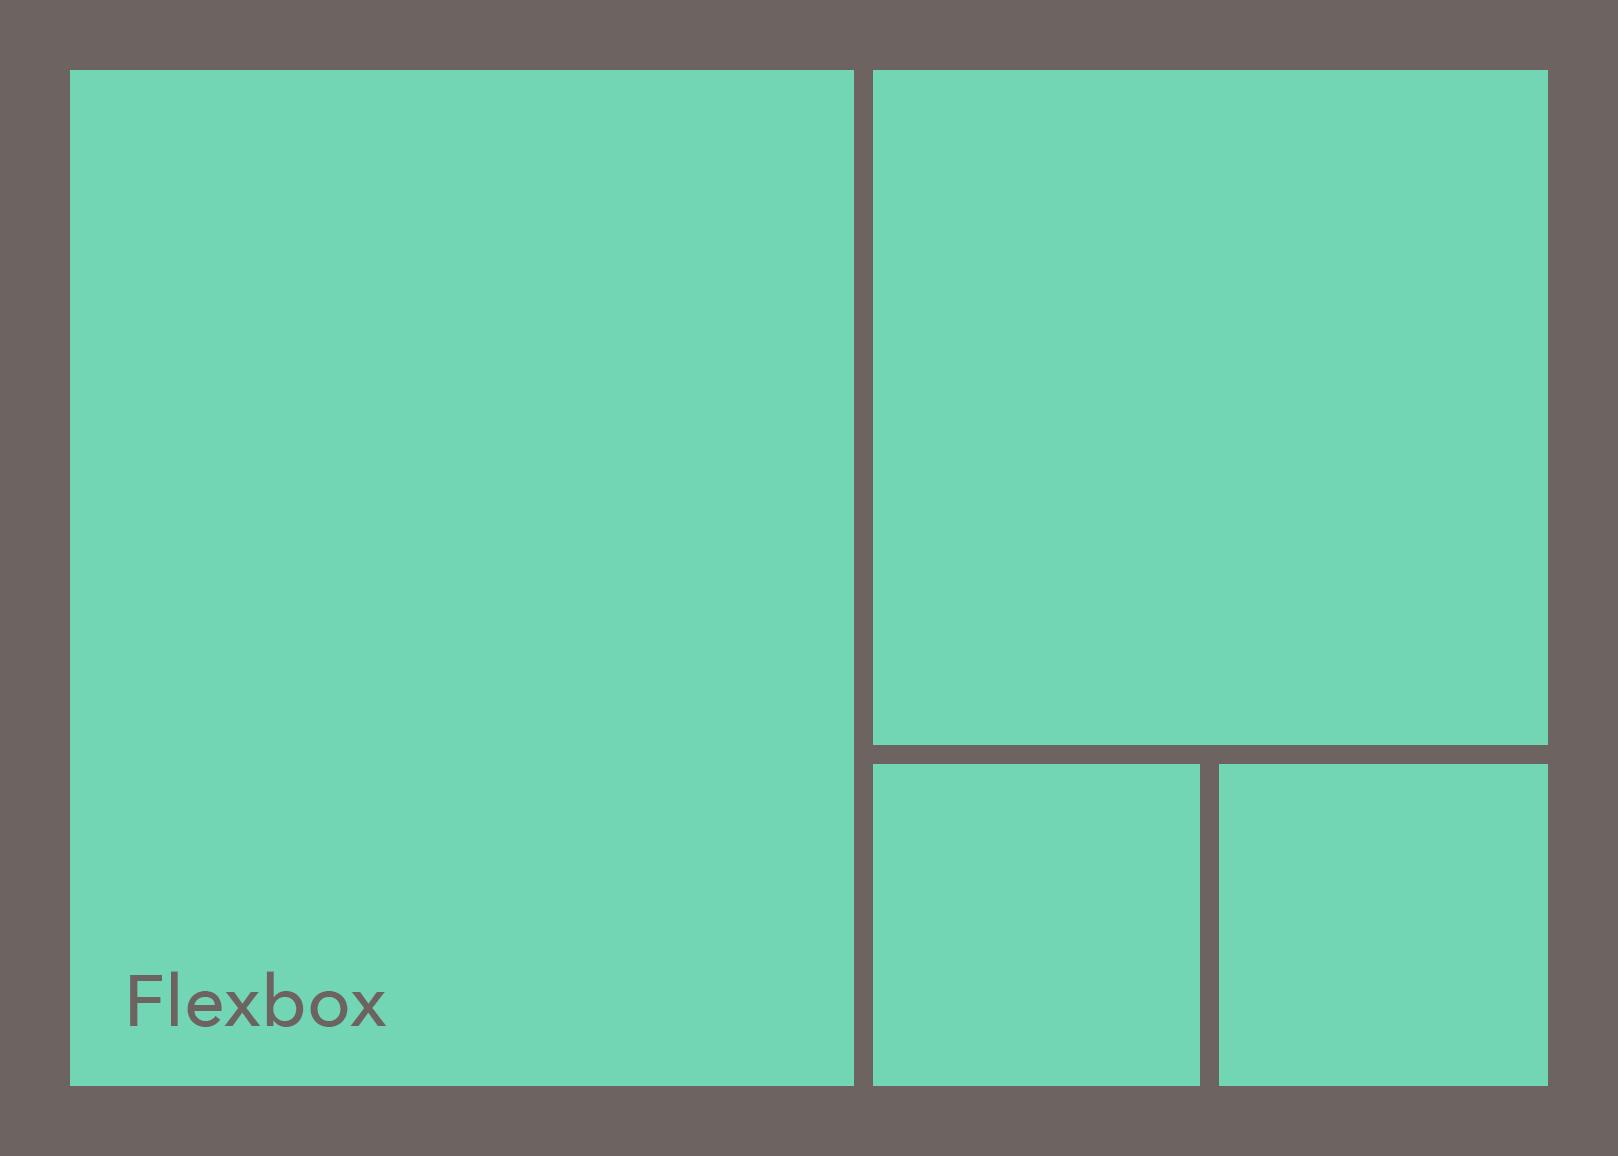 Flexbox: Building a navigation bar (Part 2/2) | developerlife com